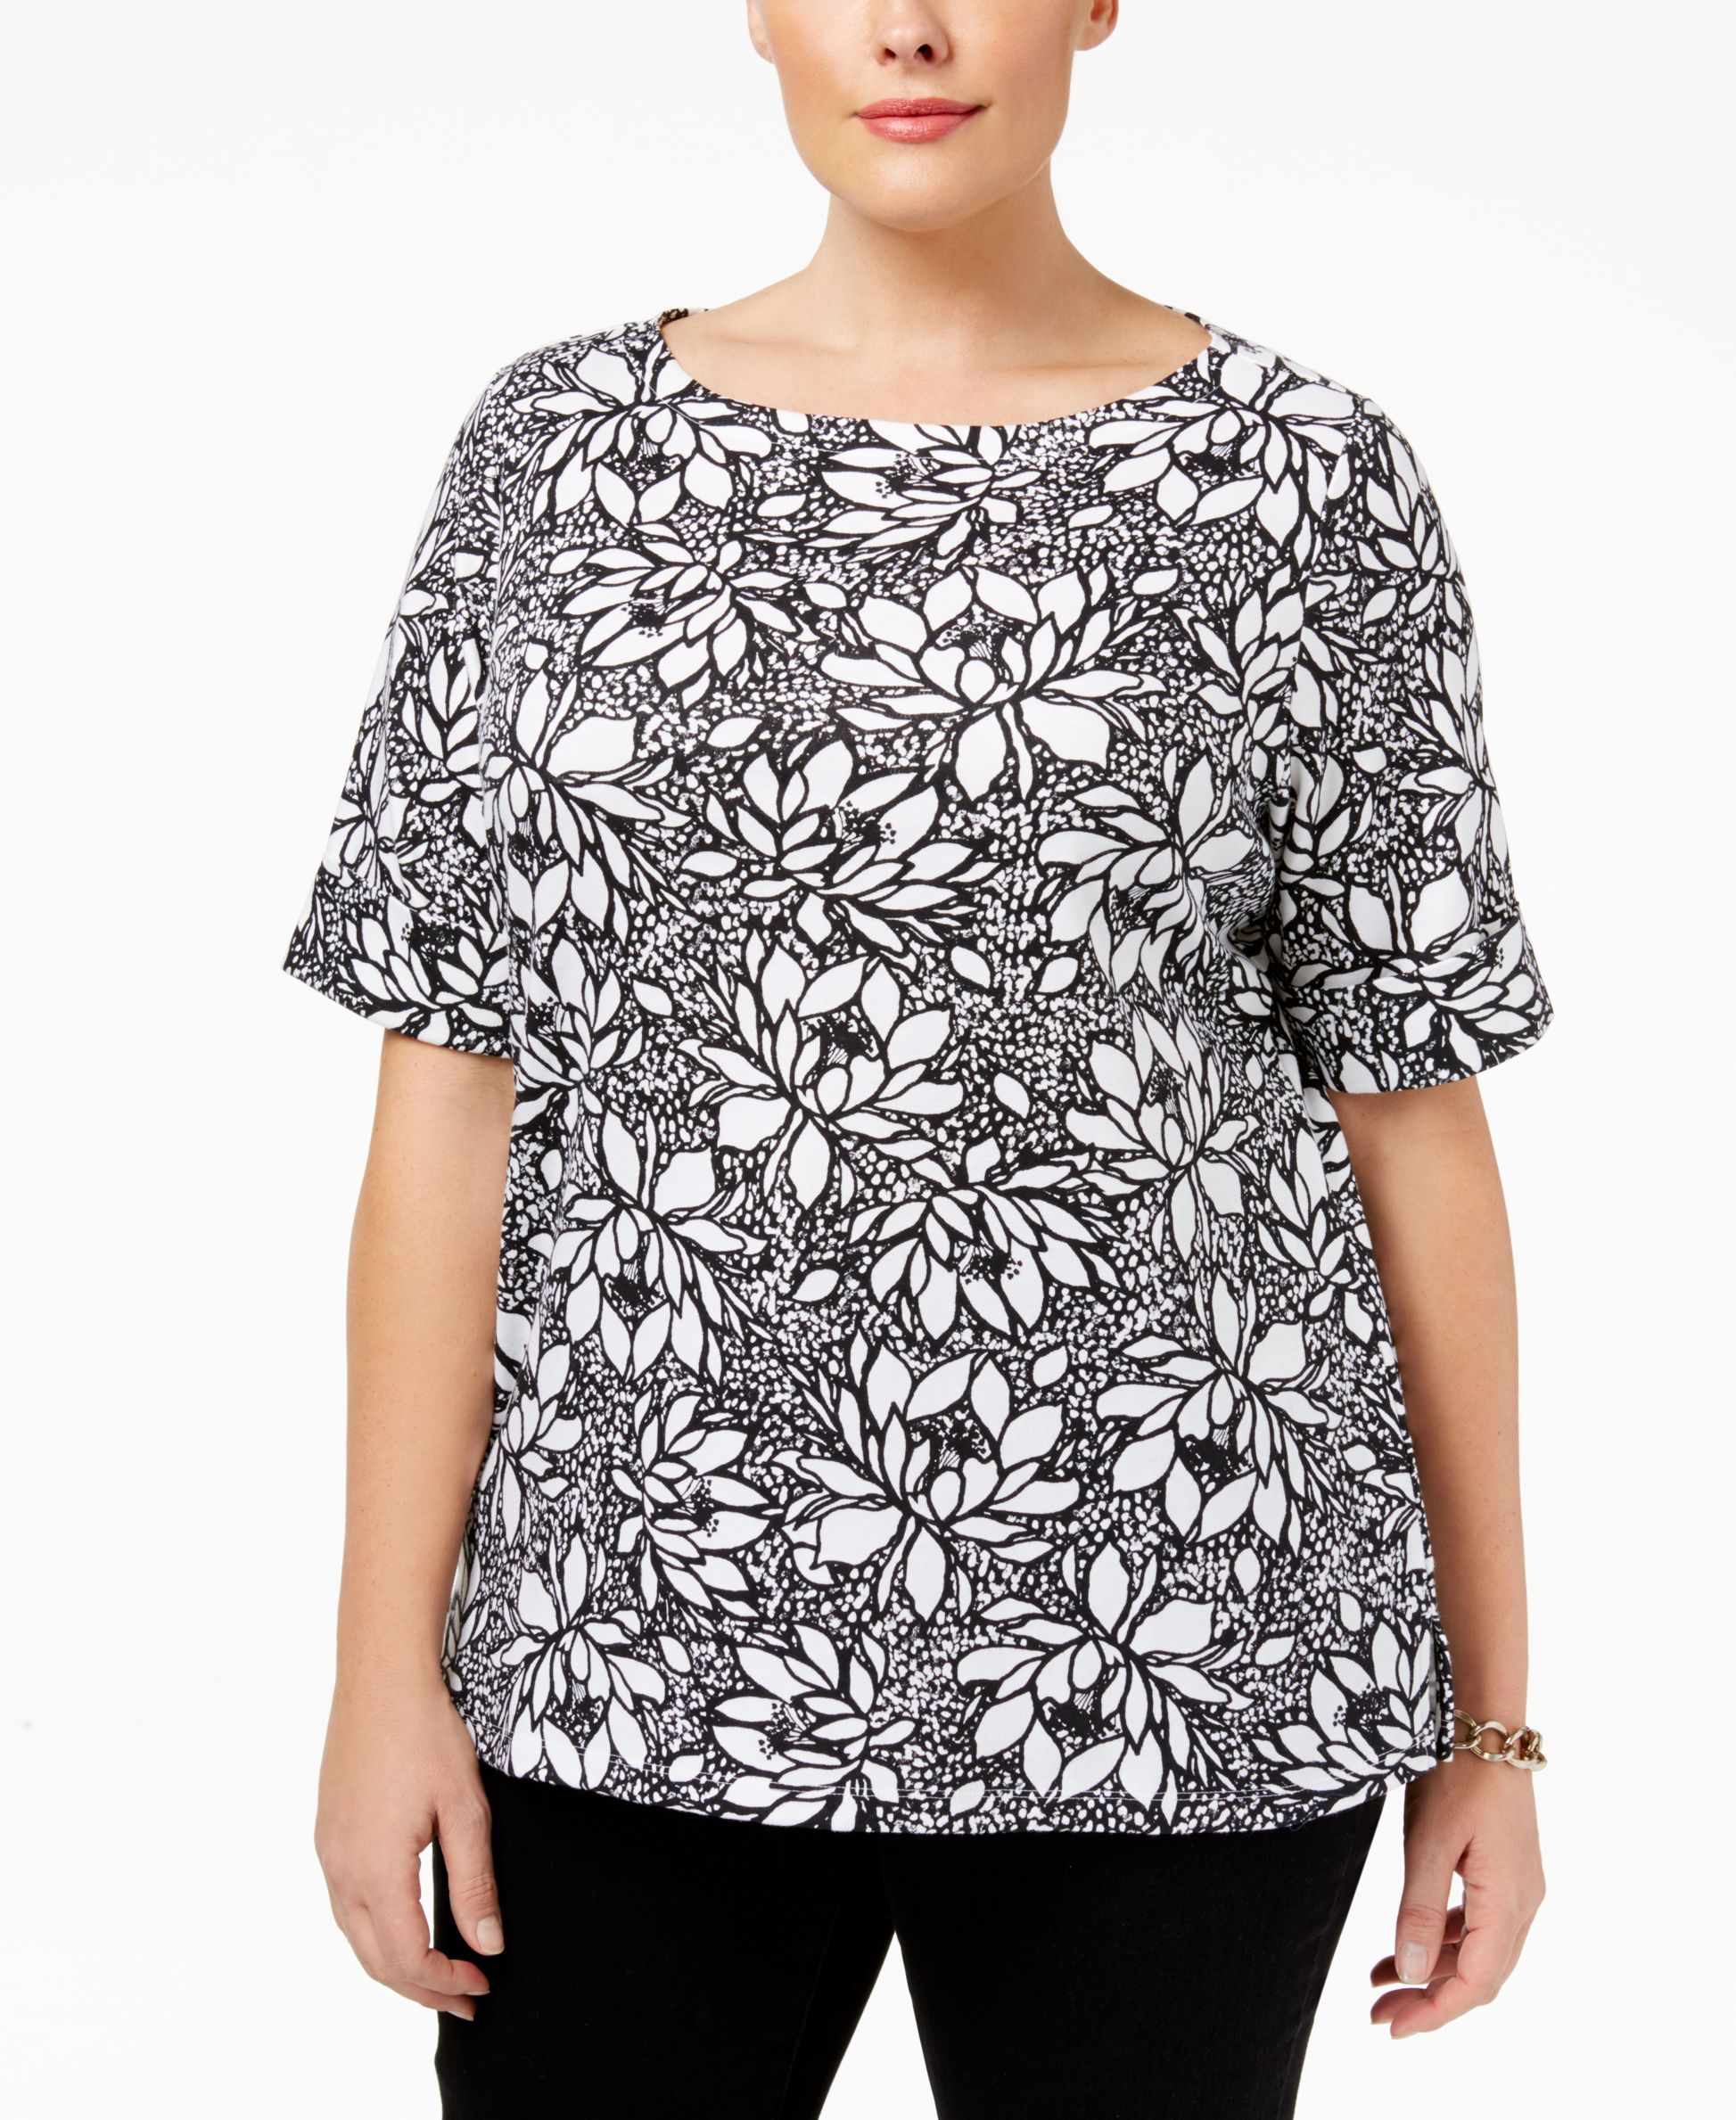 91e2bc5dd53f Karen Scott Plus Size Floral-Print Cuffed T-Shirt, Only at Macy's ...